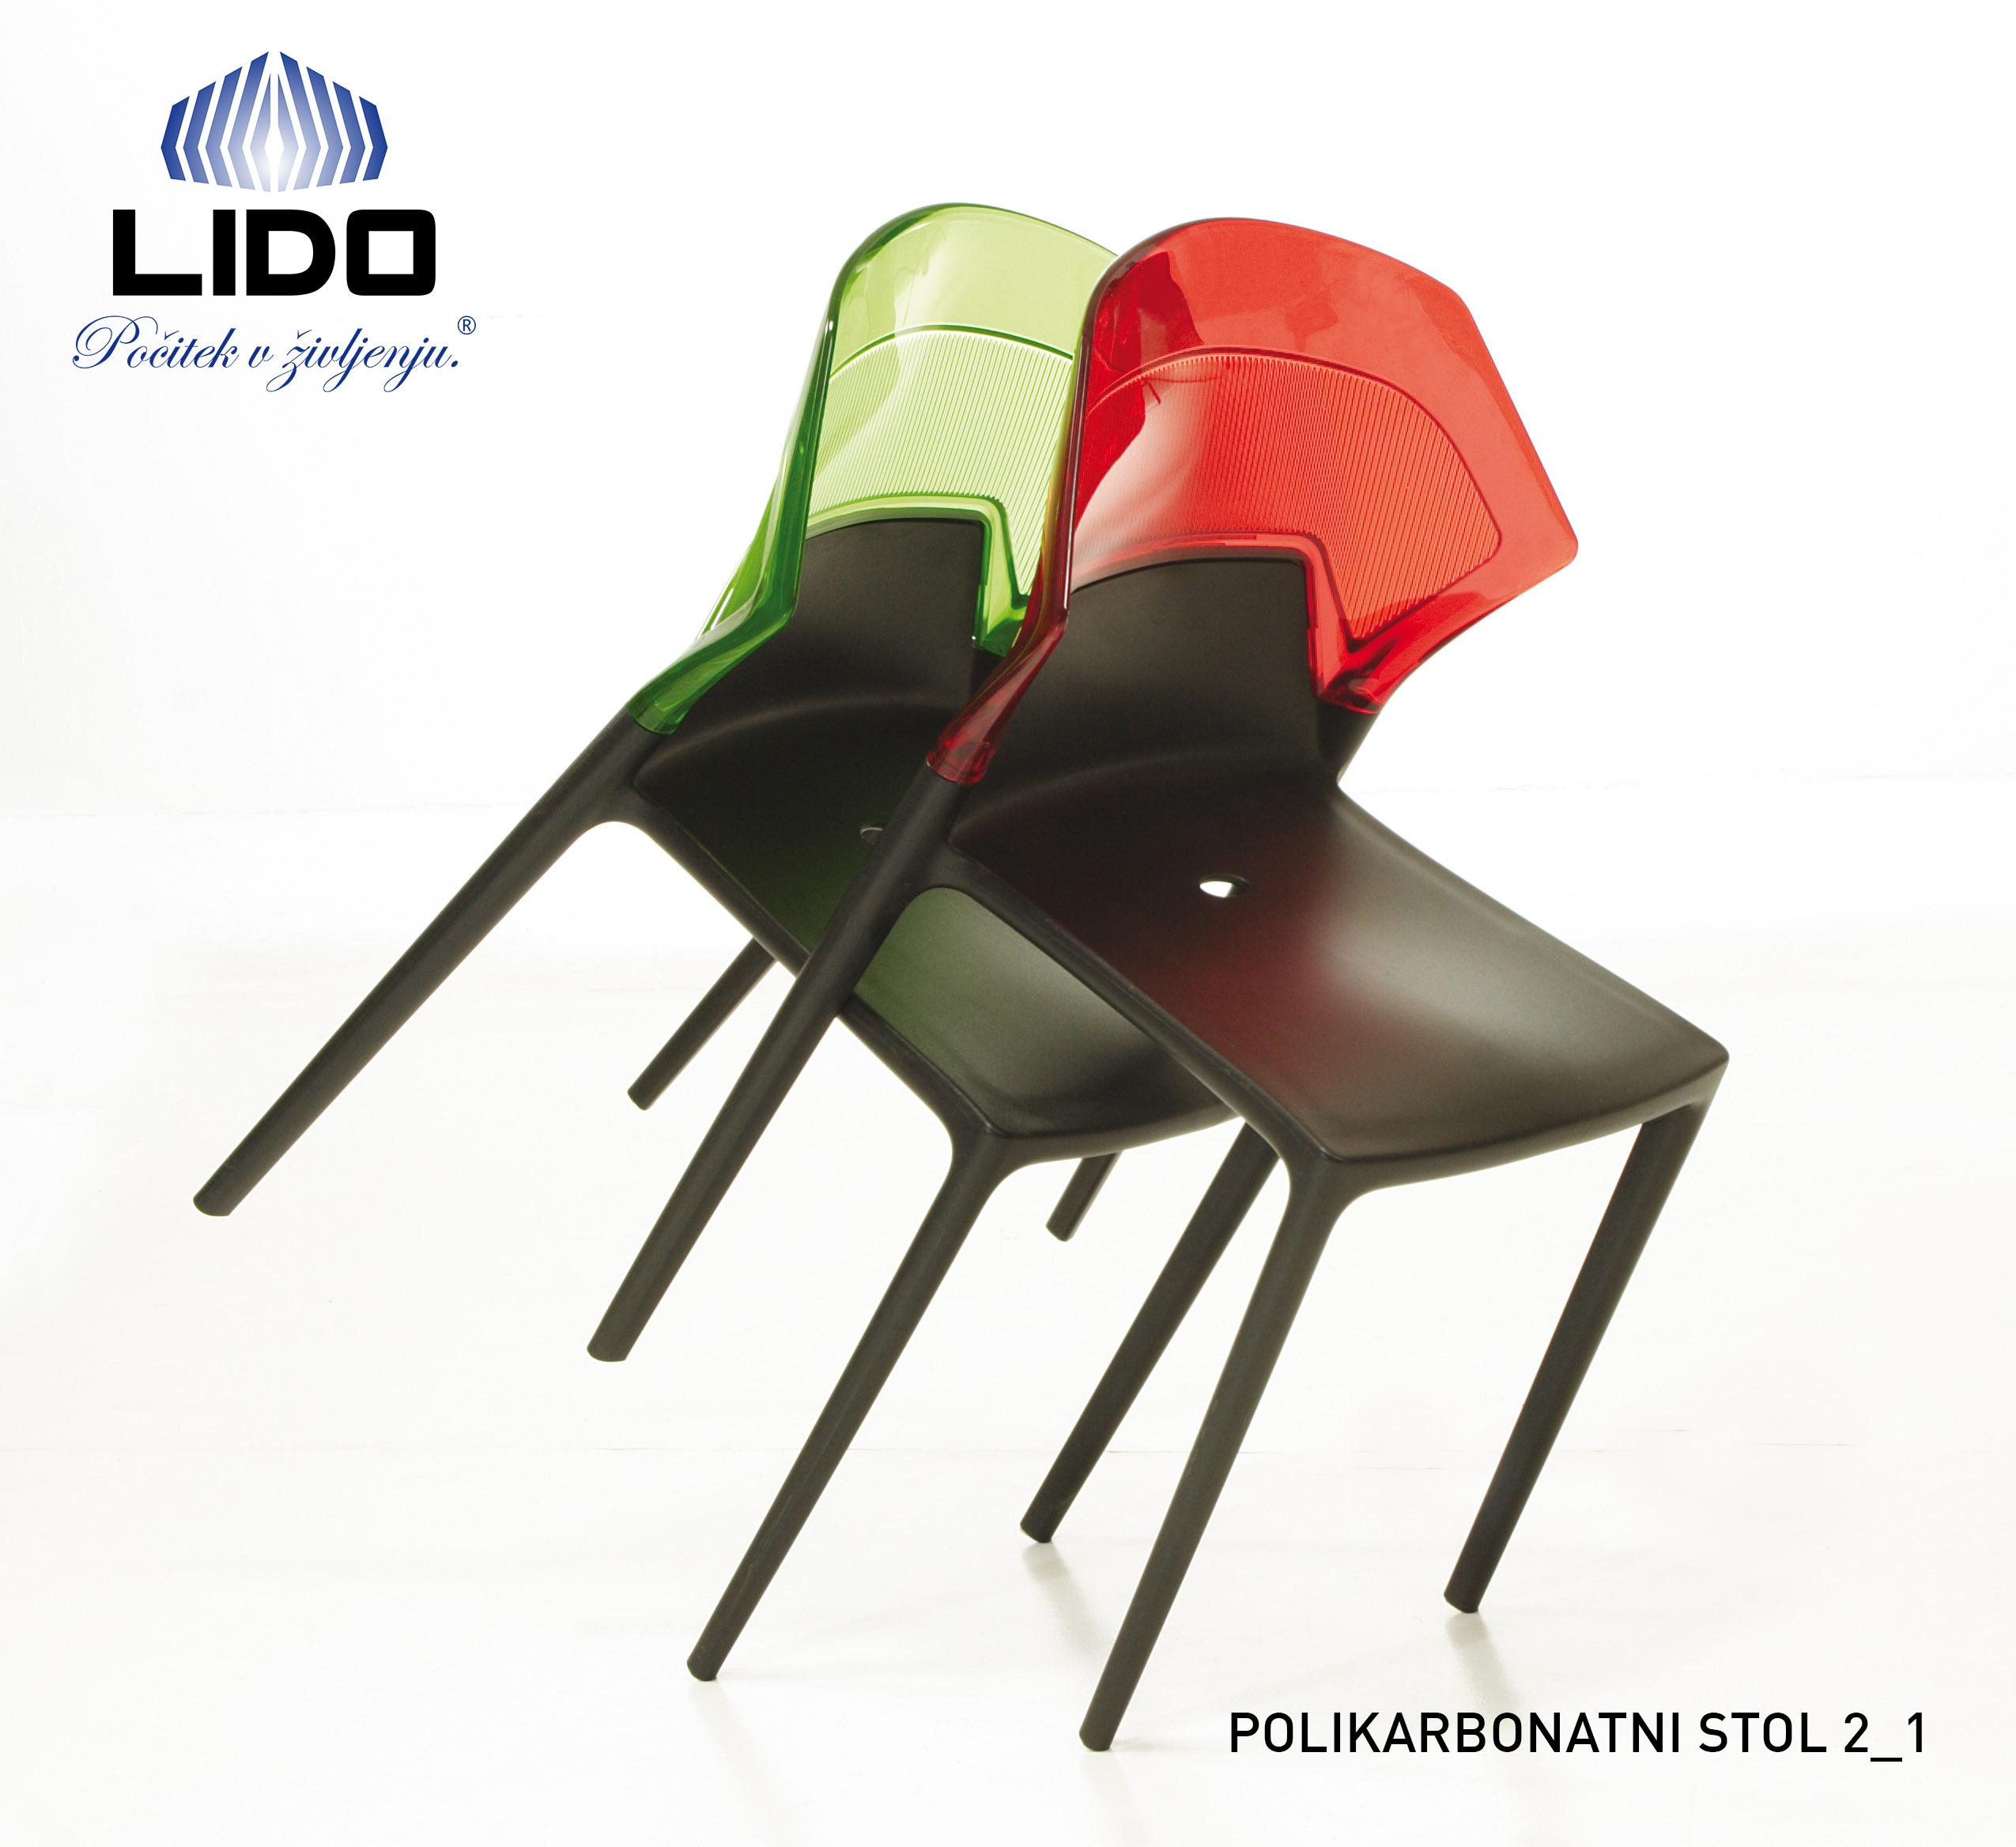 Lido_Polikarbonatni stoli 2_1